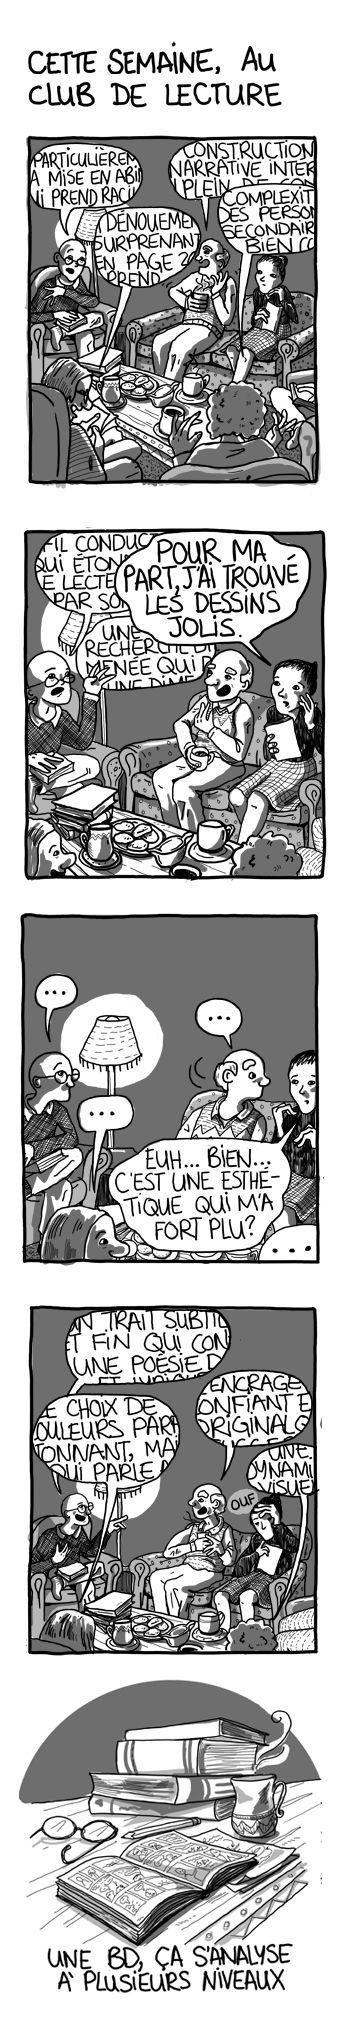 une_bd_ca_sanalyse